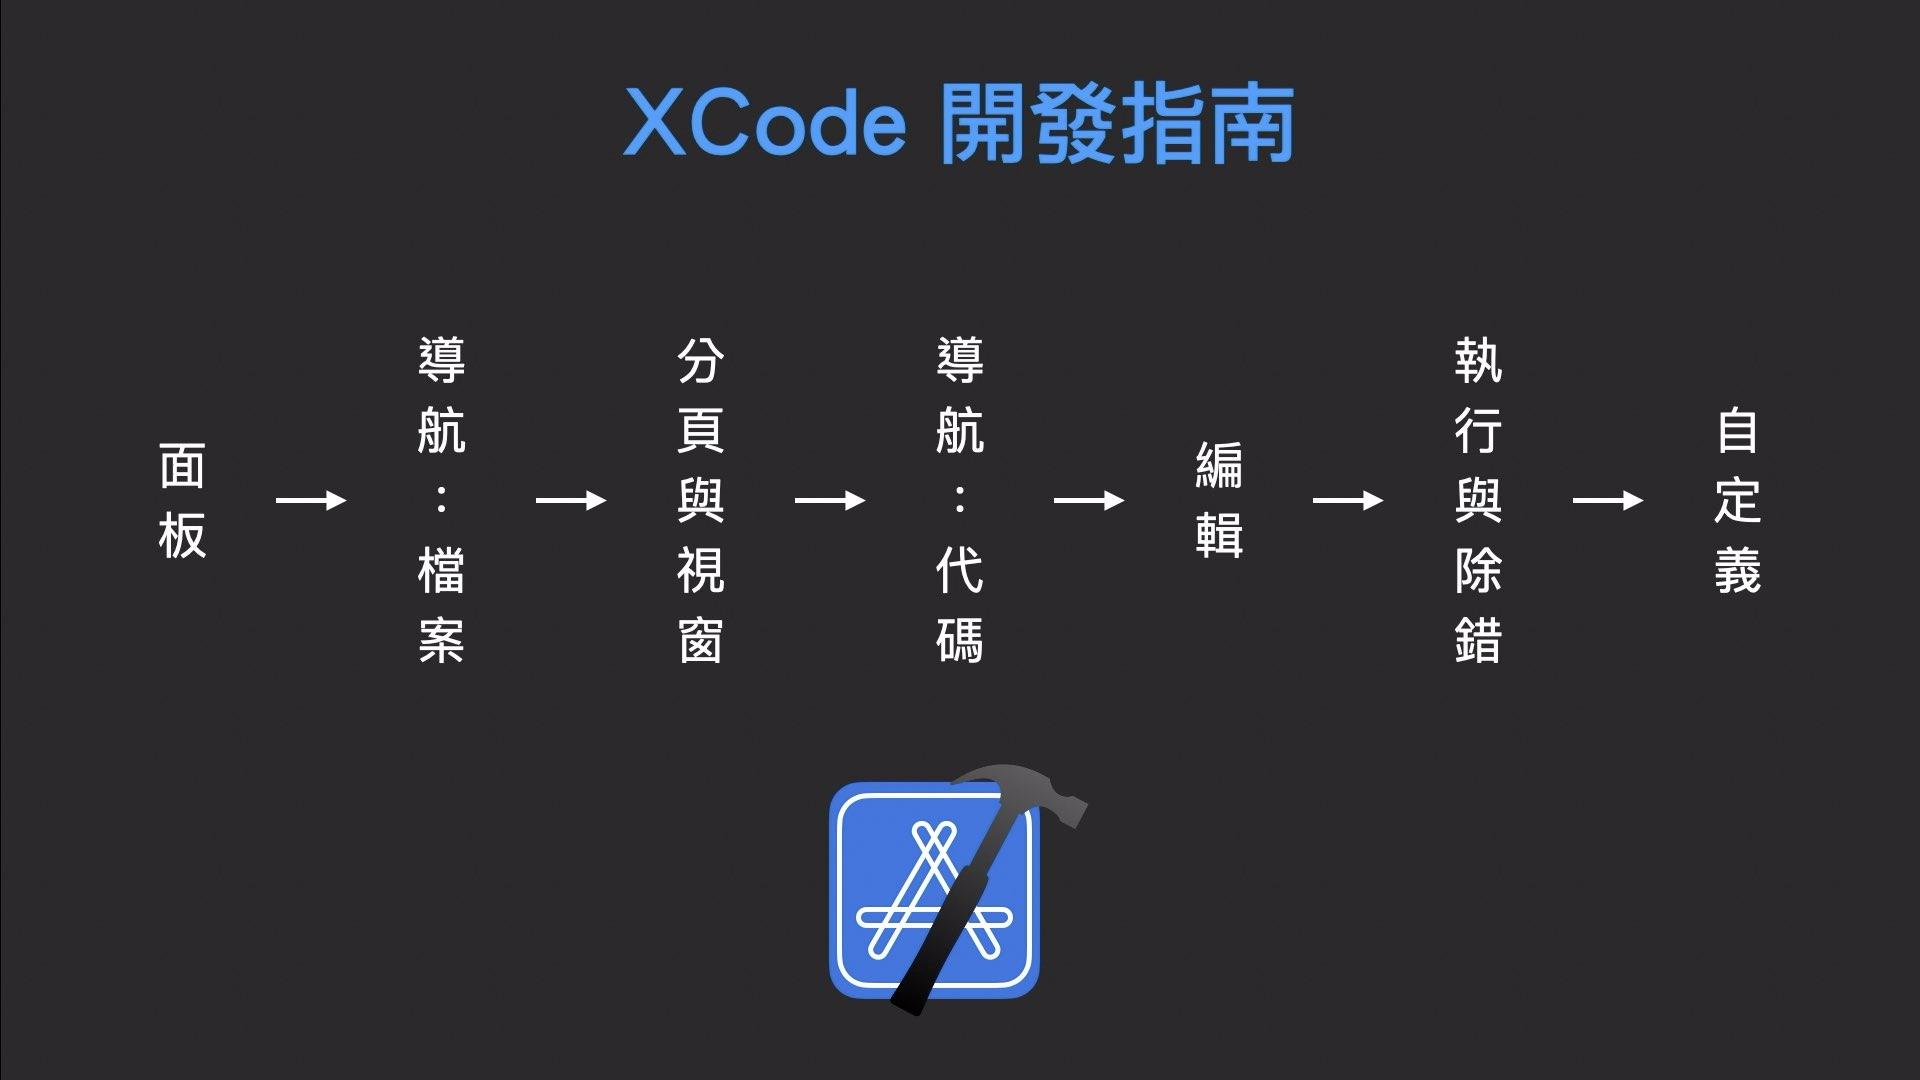 003.xcode-contents